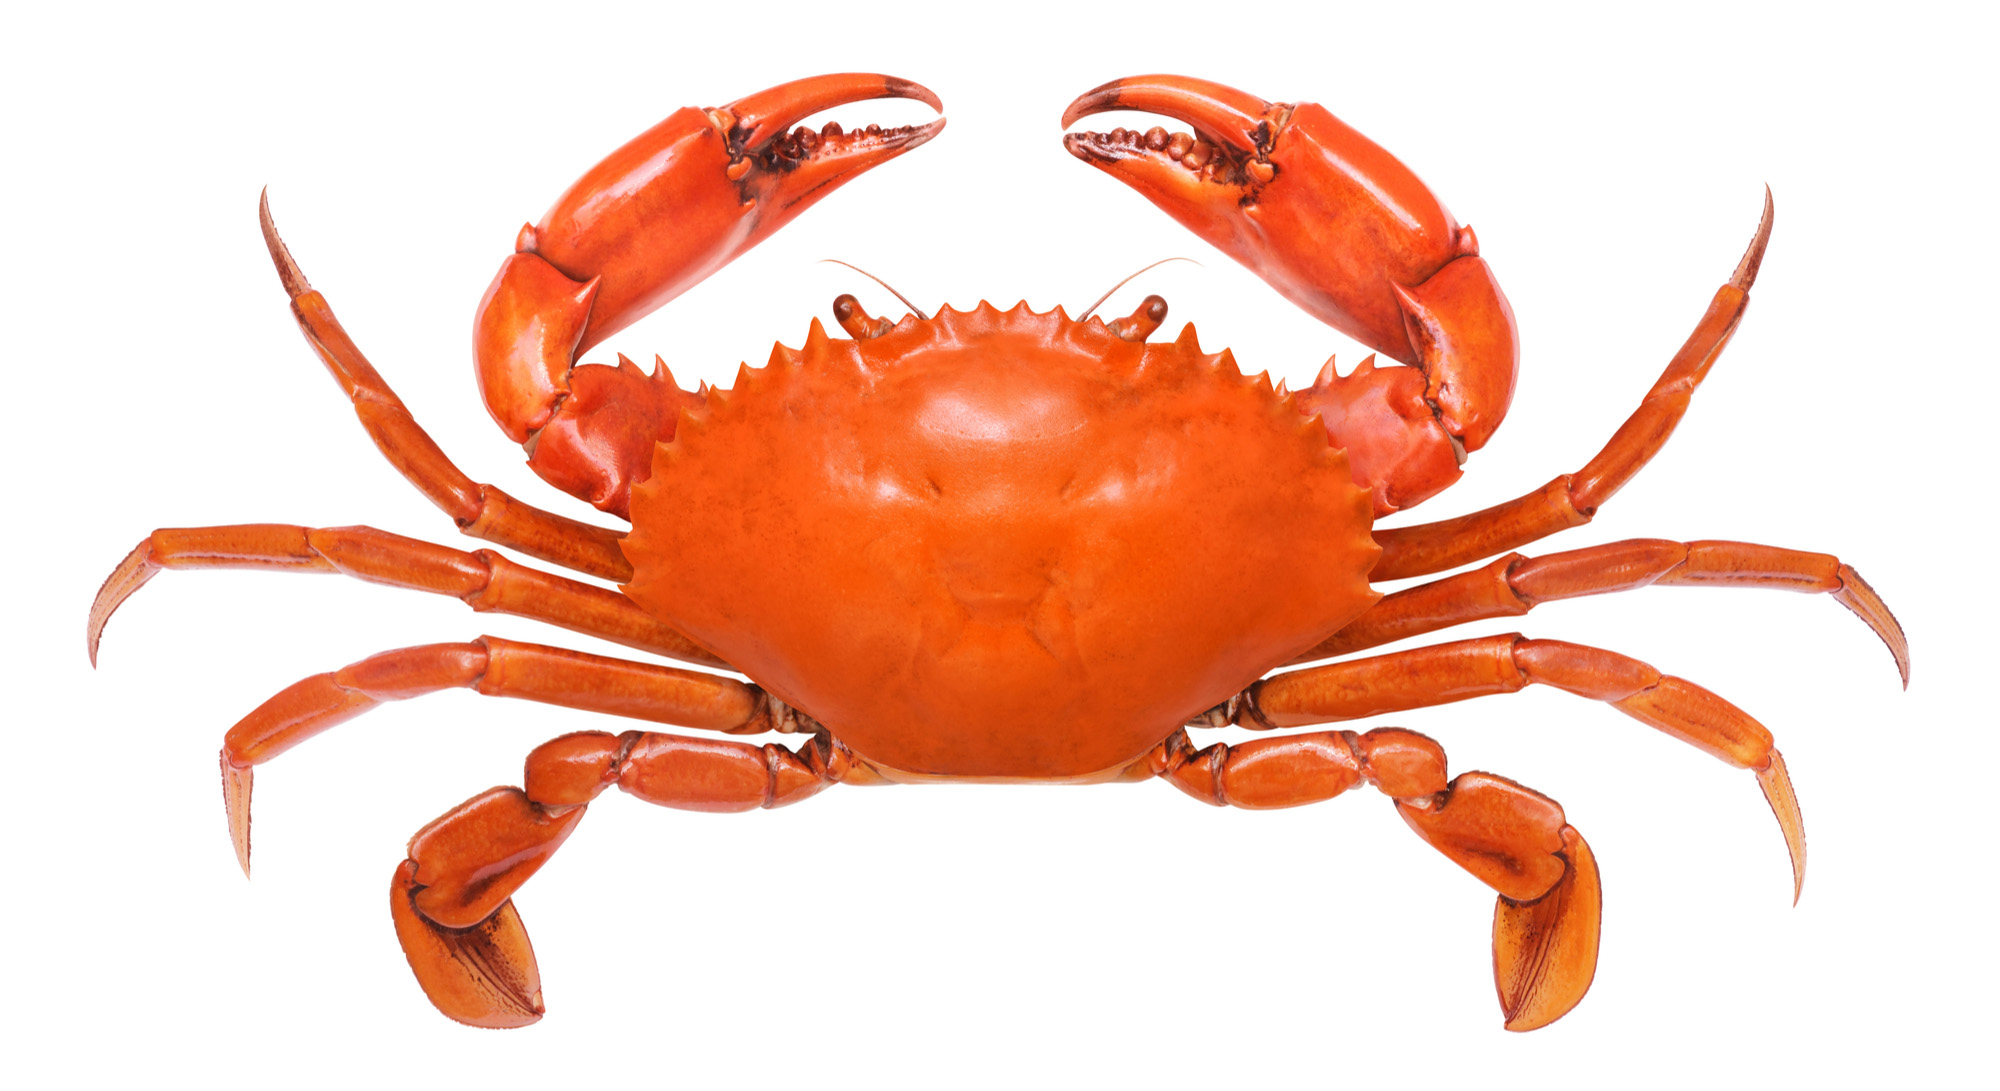 Crab-72 ppi